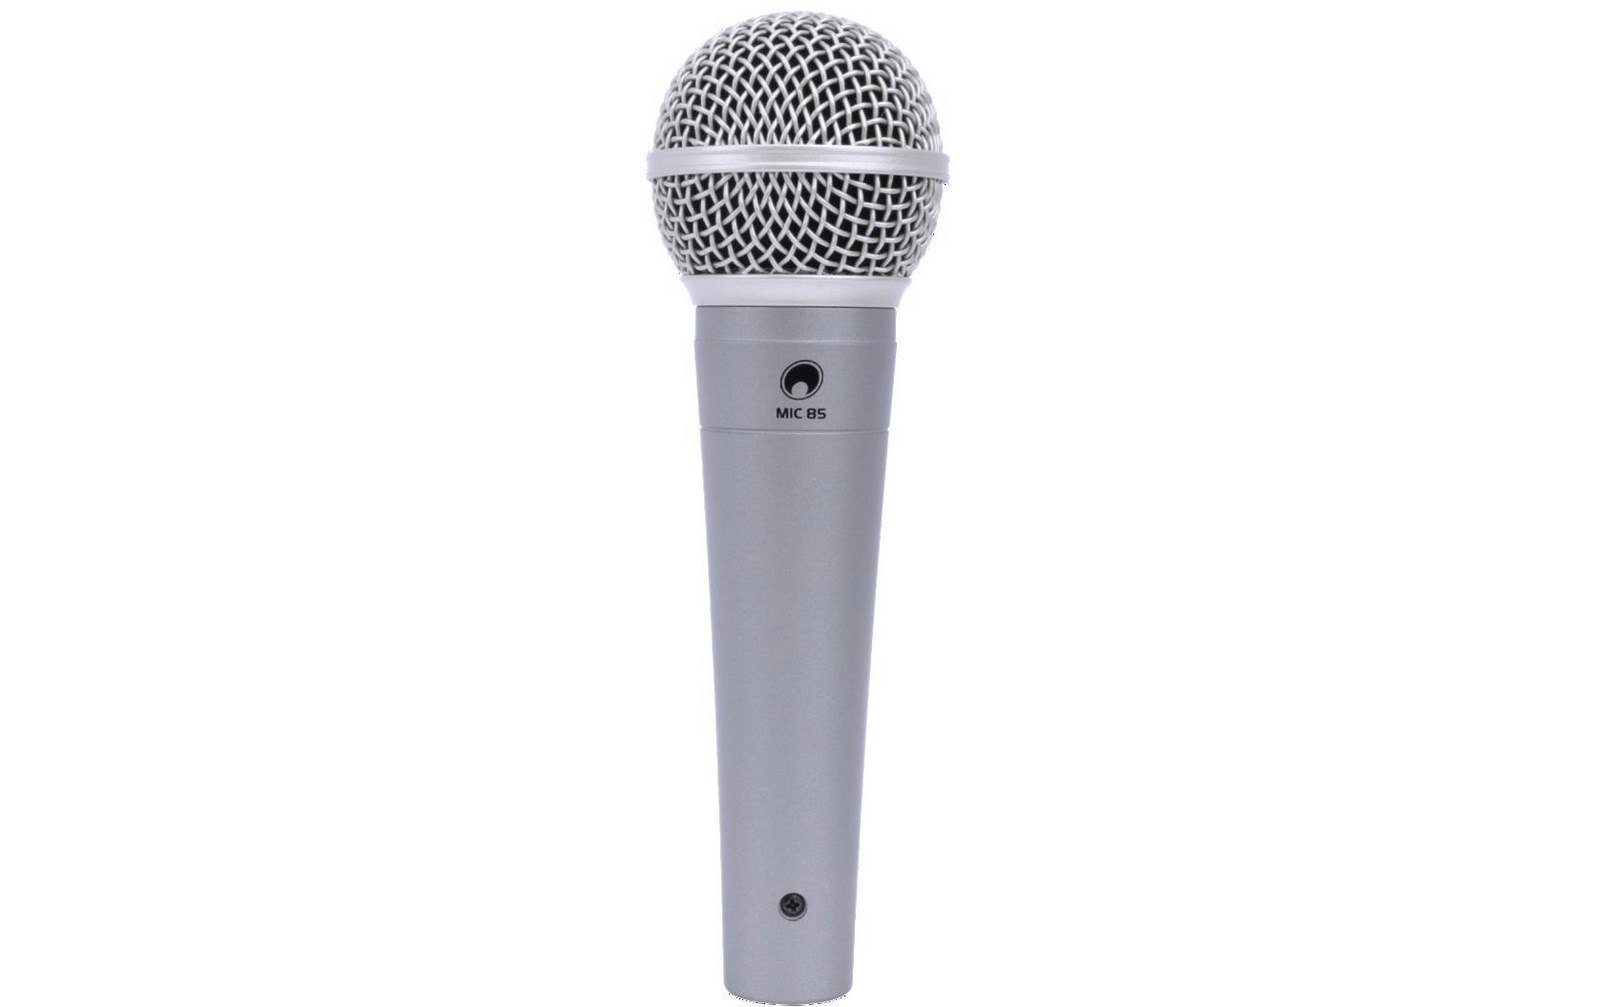 omnitronic-mic-85-dynamisches-mikrofon